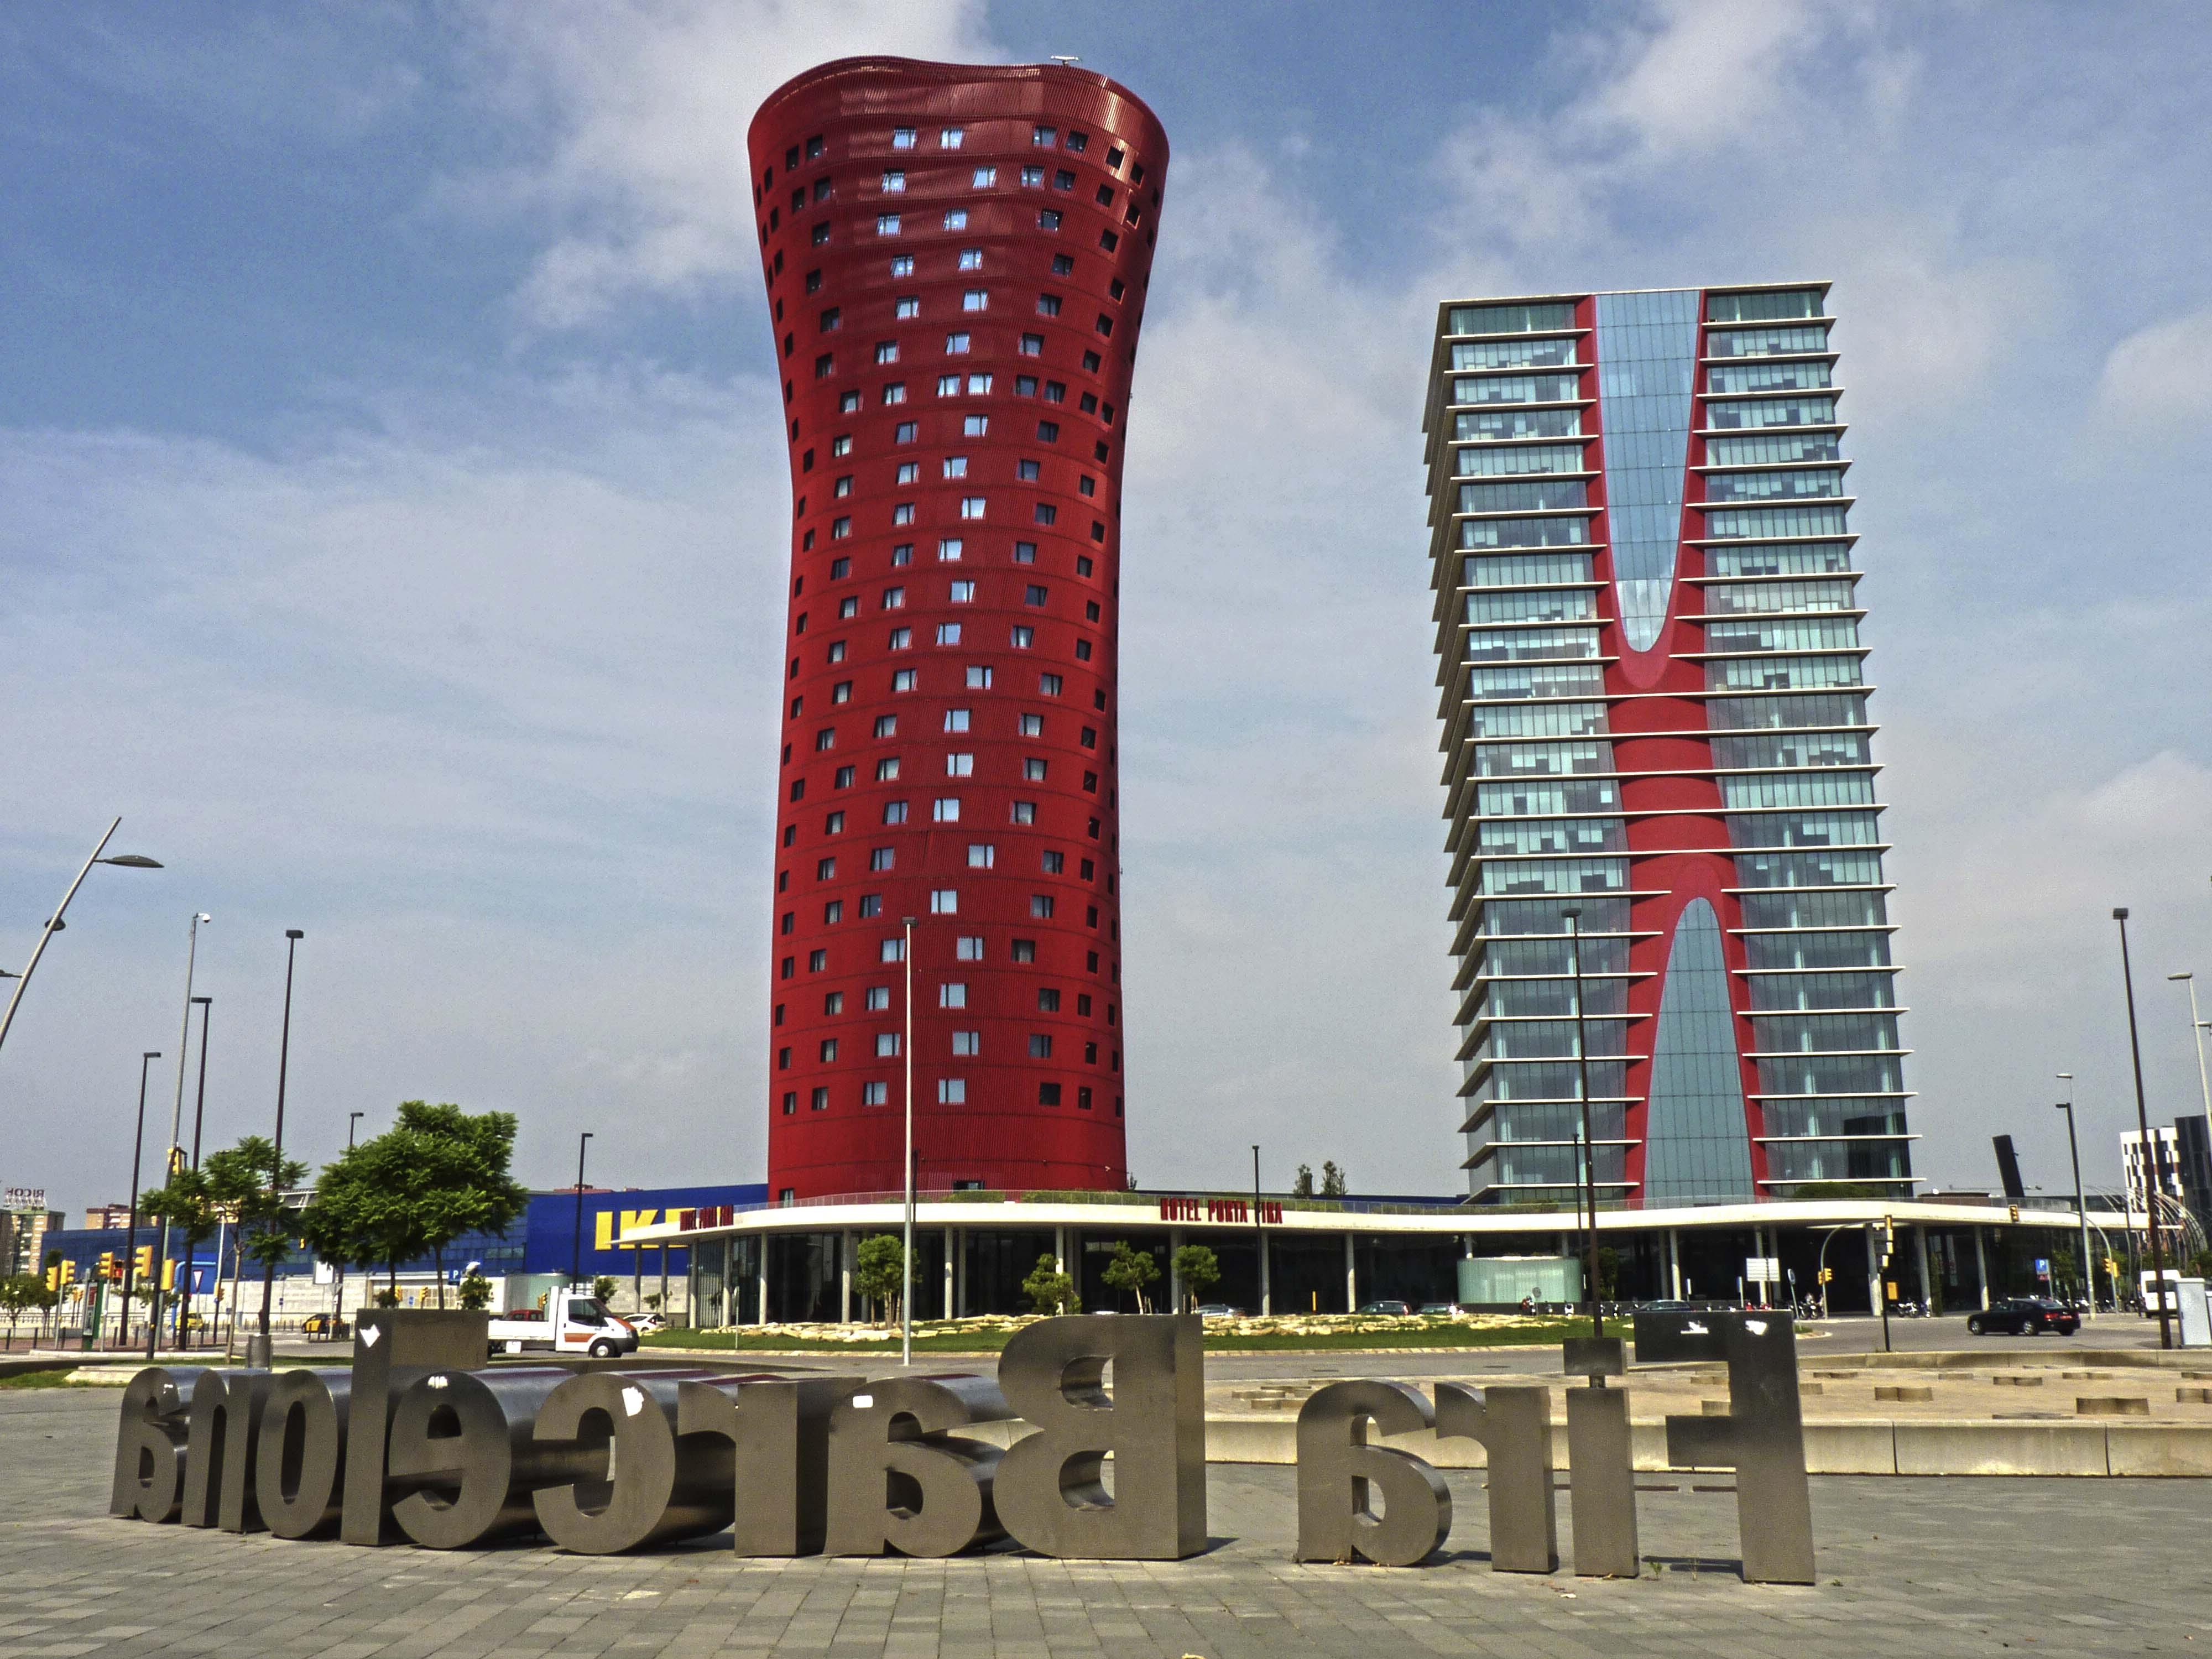 Mi skyline particular de Barcelona